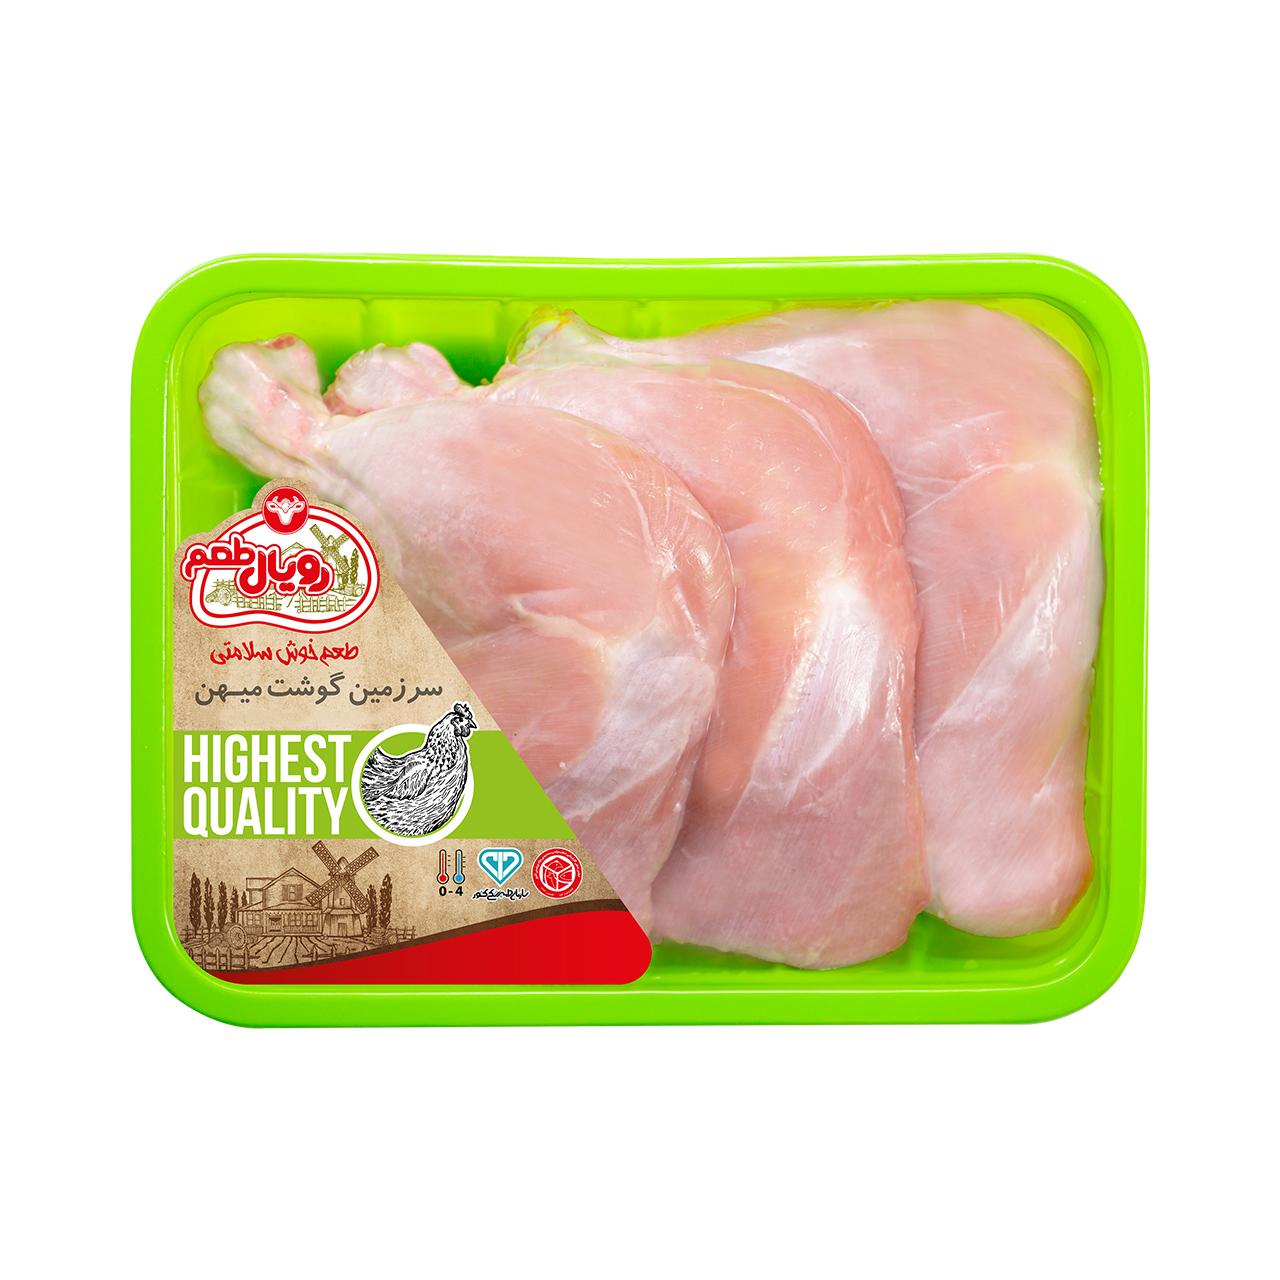 ران مرغ بدون پوست رويال طعم - 900 گرم  main 1 2